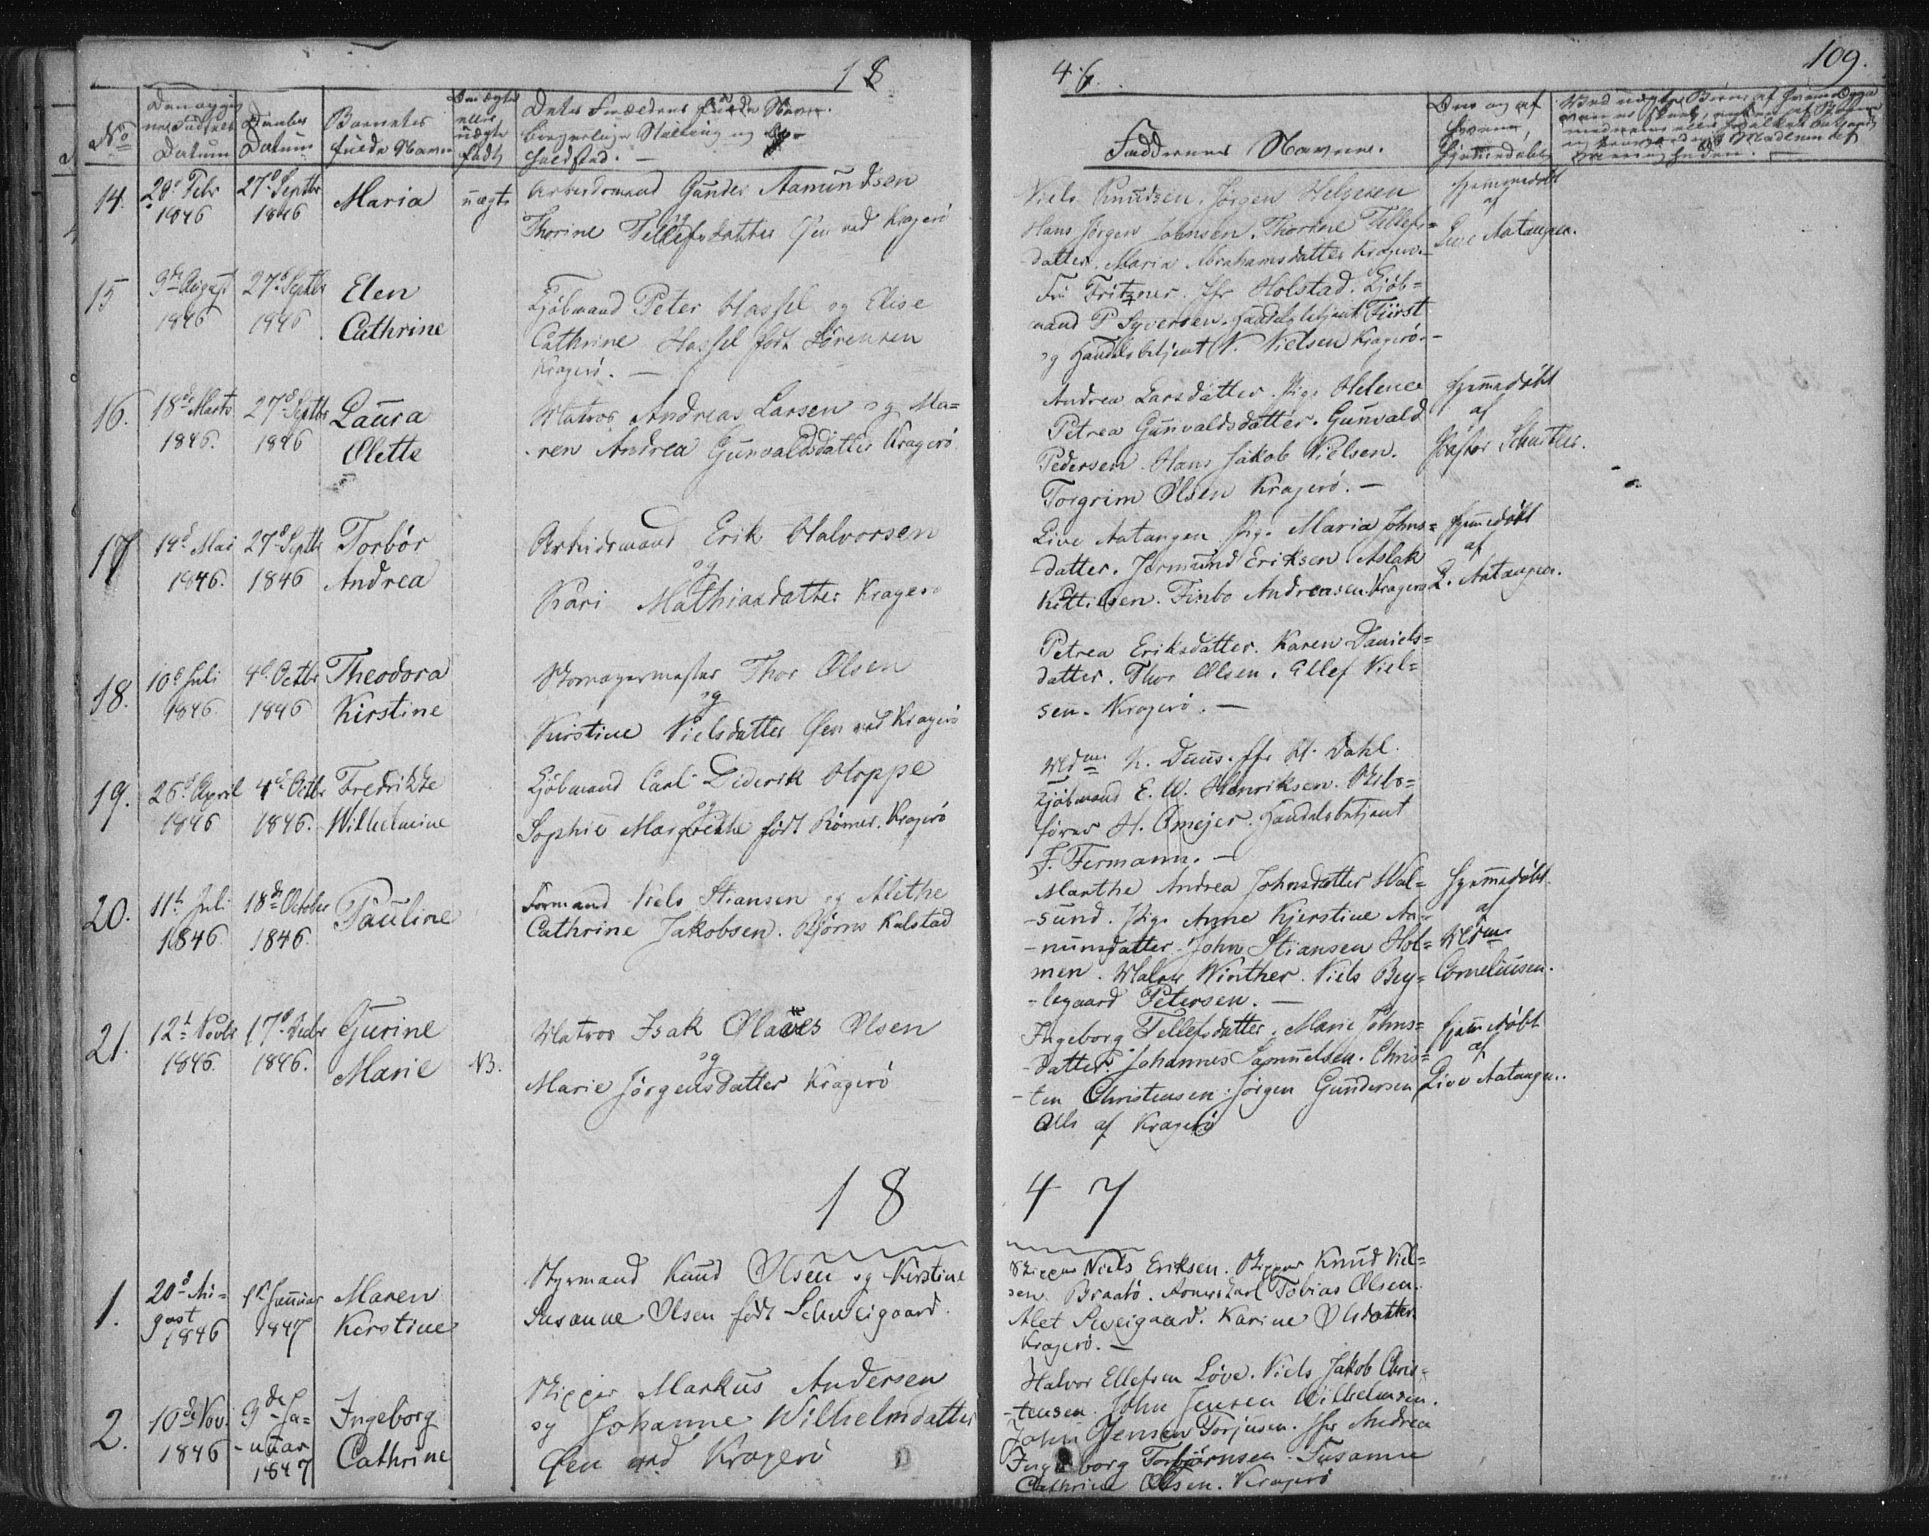 SAKO, Kragerø kirkebøker, F/Fa/L0005: Ministerialbok nr. 5, 1832-1847, s. 109